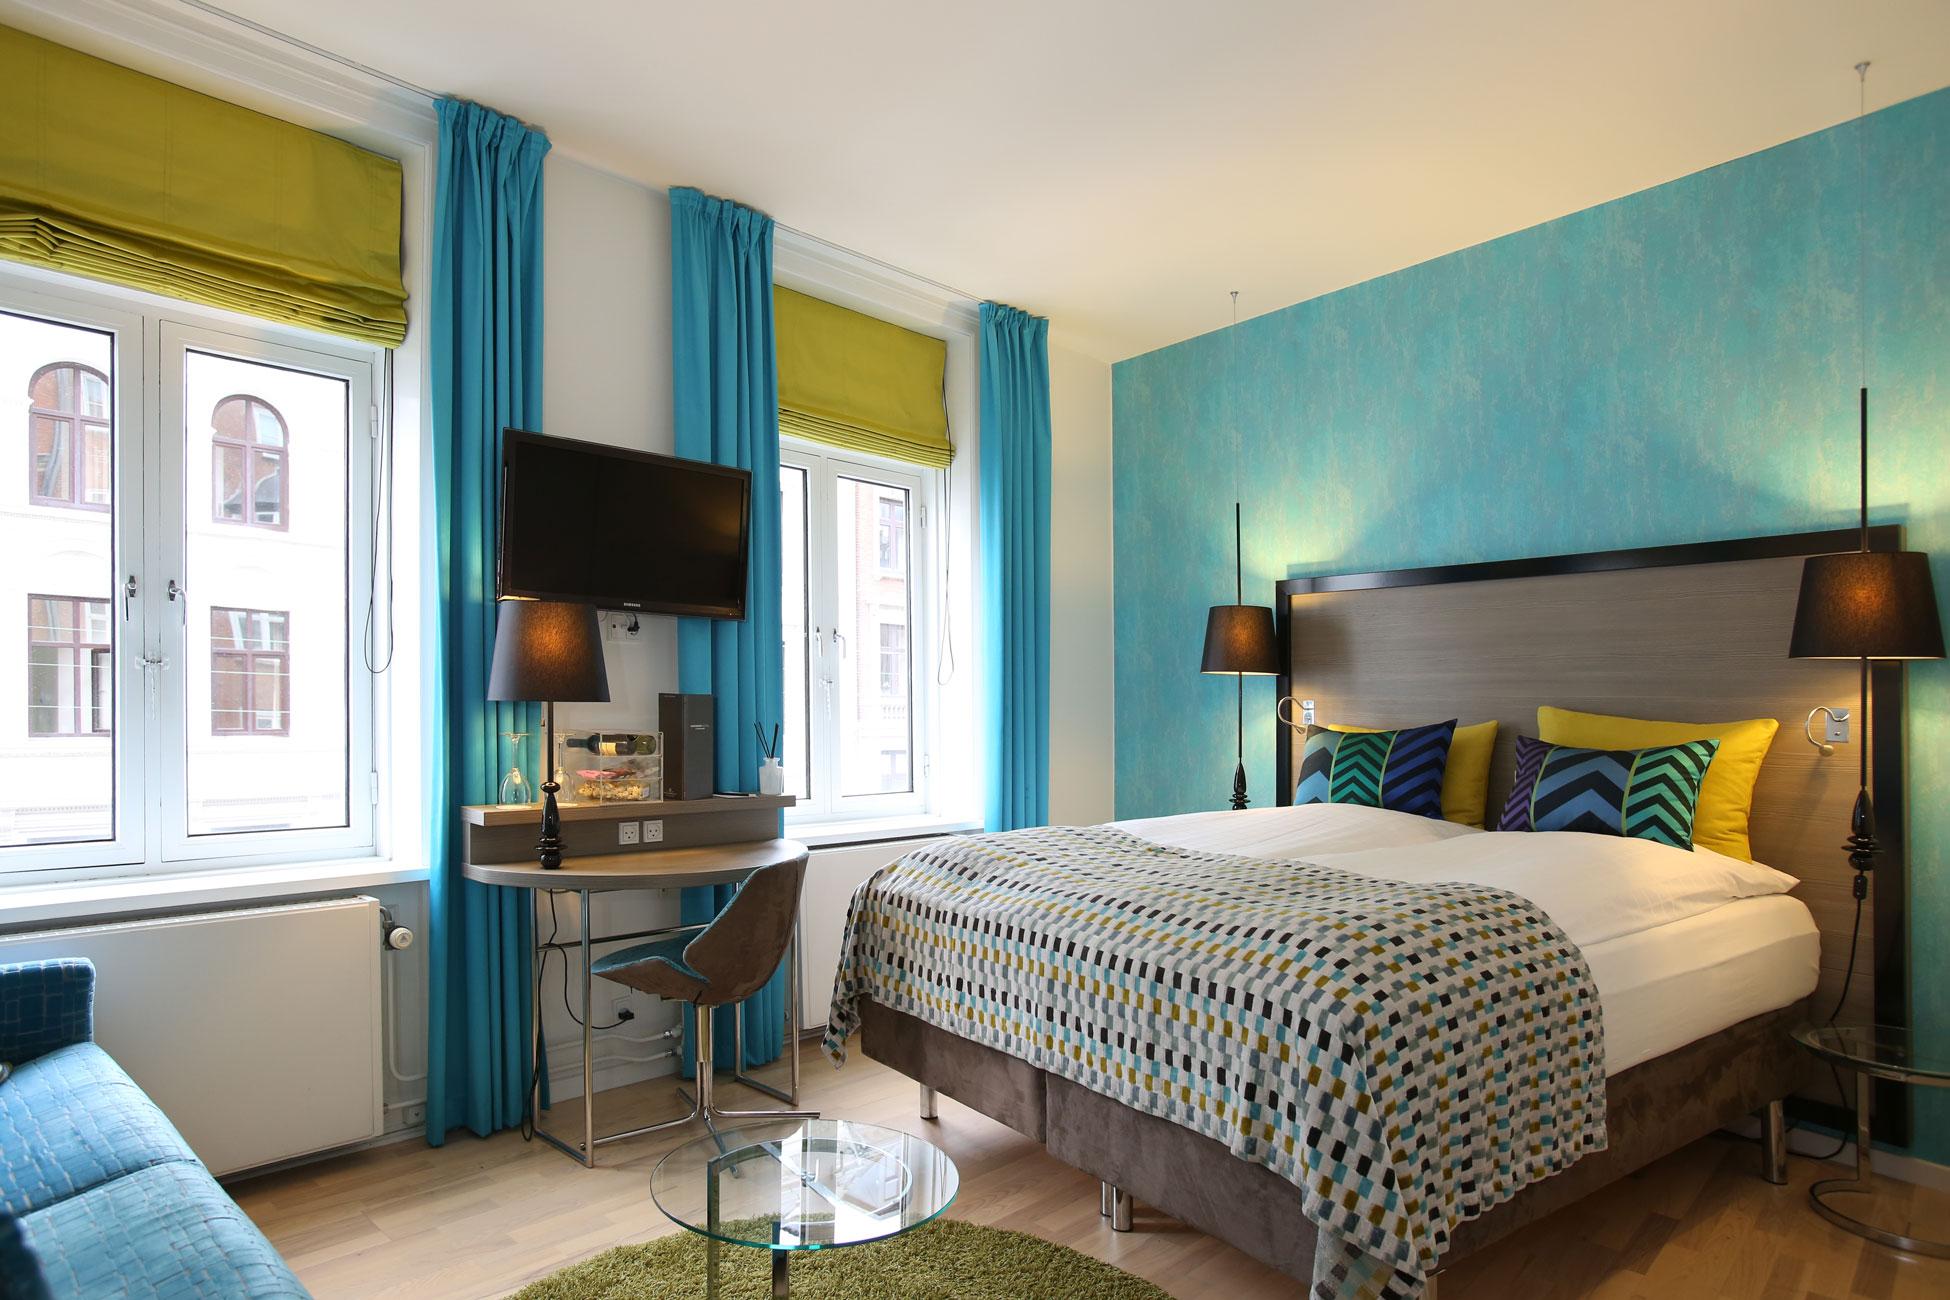 Hotel photography, bedroom interior